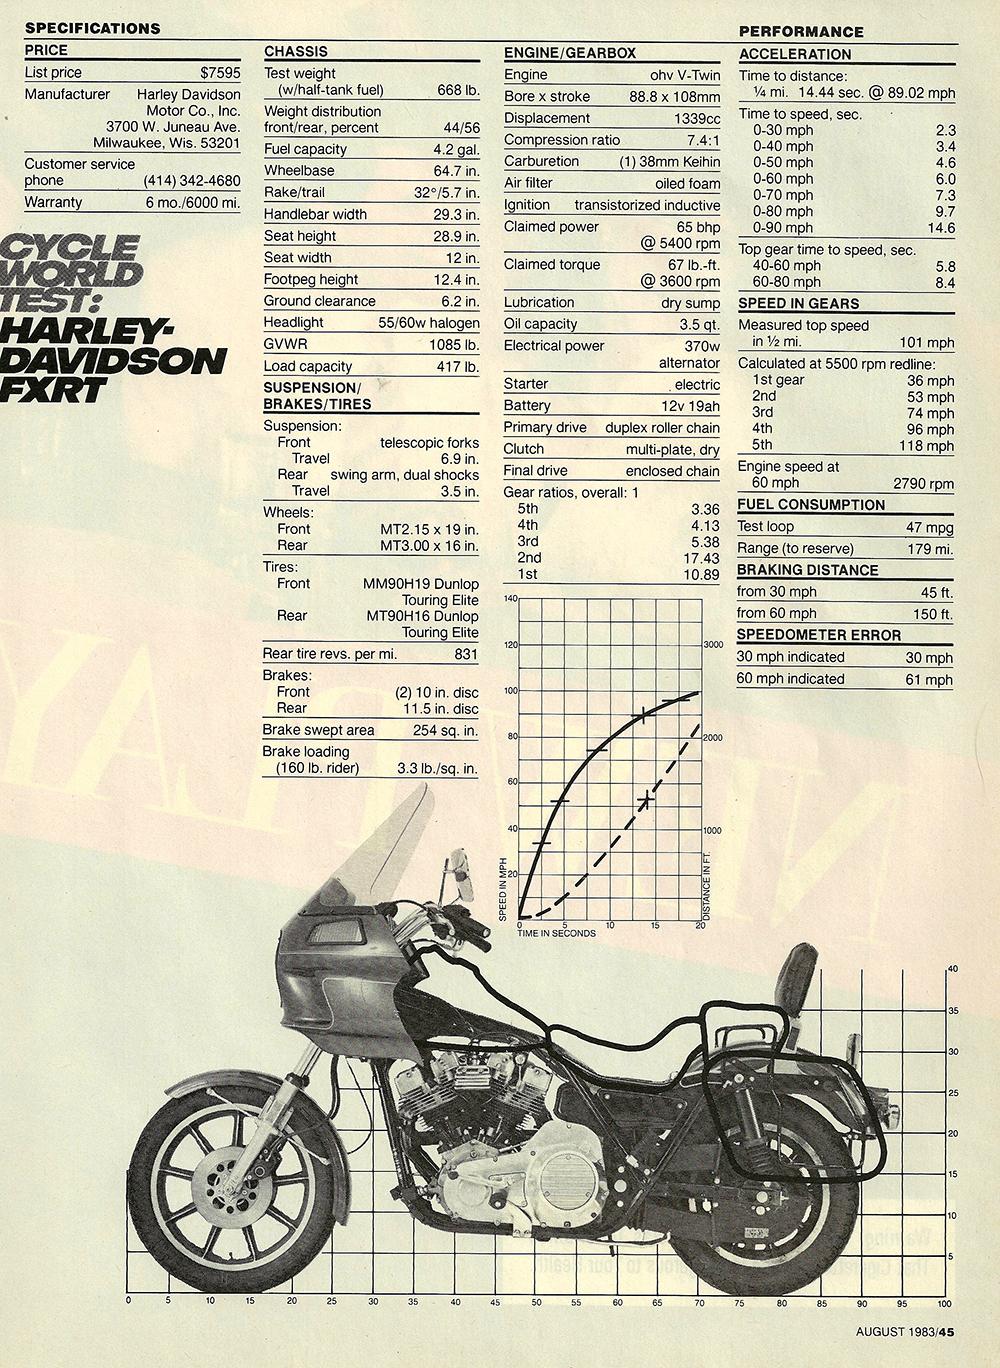 1983 Harley-Davidson FXRT road test 06.jpg